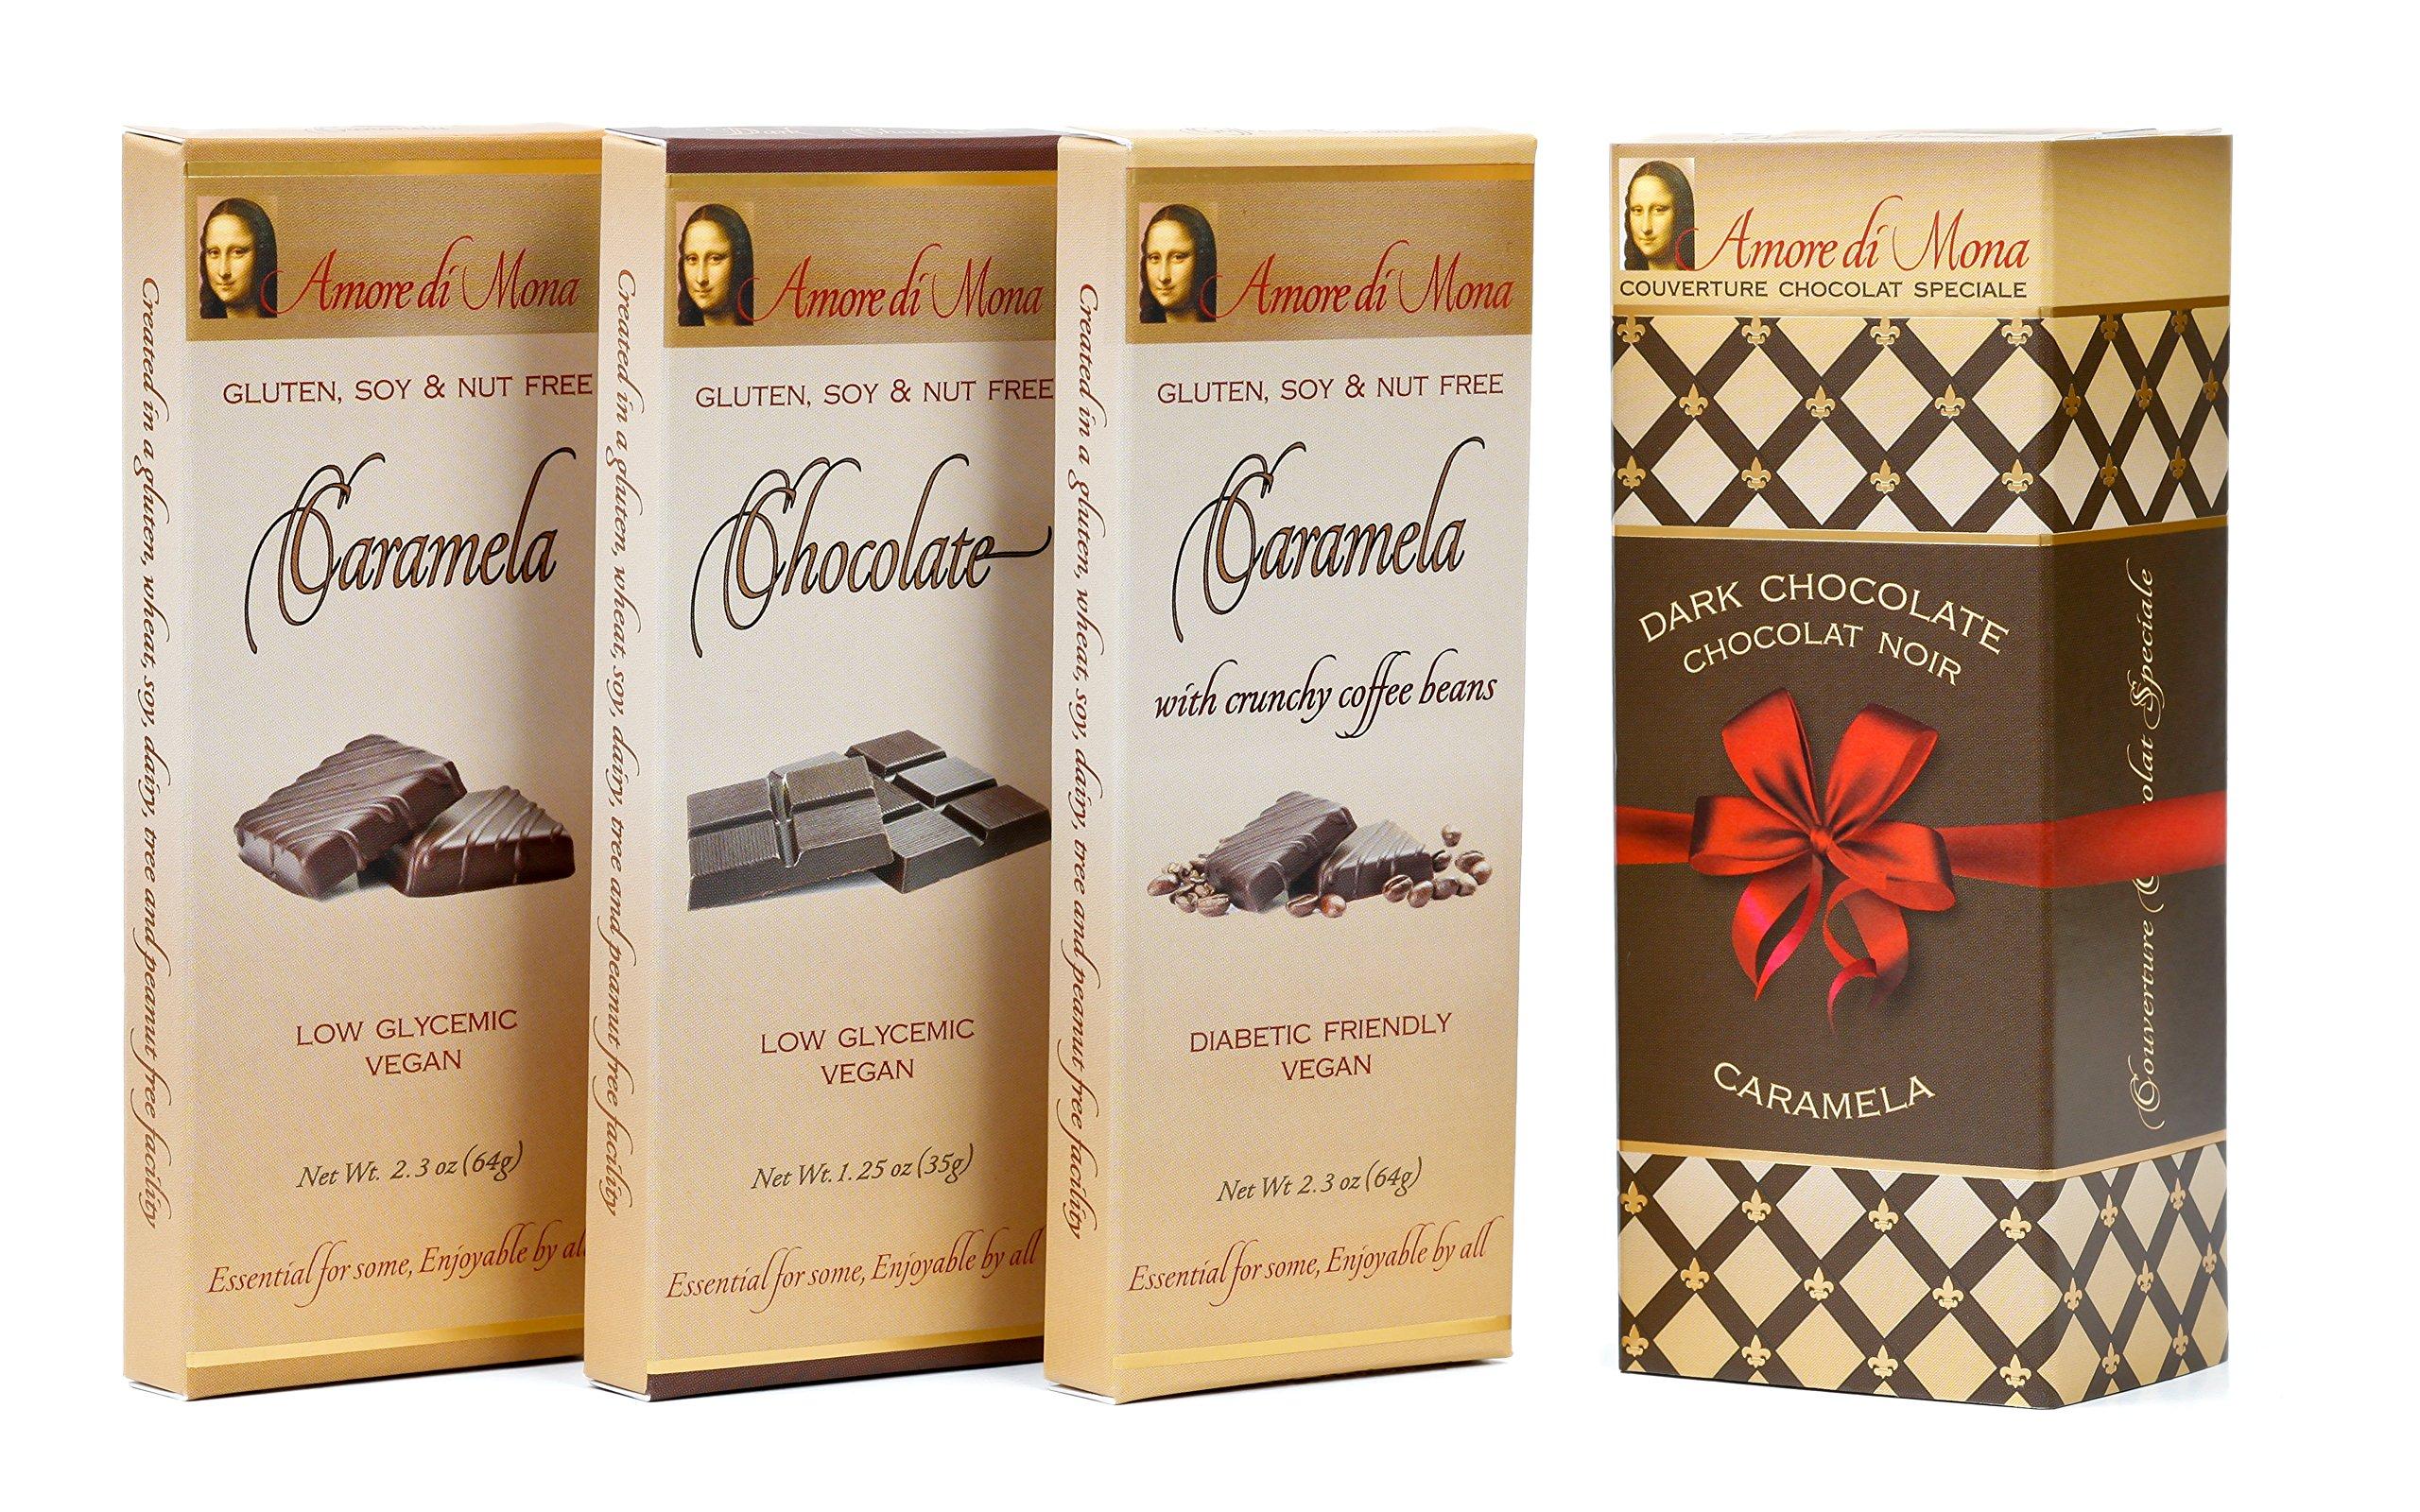 Amore di Mona Artisanal Vegan Chocolate Gift - Primo 3 Pack: Chocolate, Caramela, Coffee Caramela. Premium Ingredients are All Natural, Non-GMO, Kosher. Gluten, Soy, Sesame, Milk, Nut Free